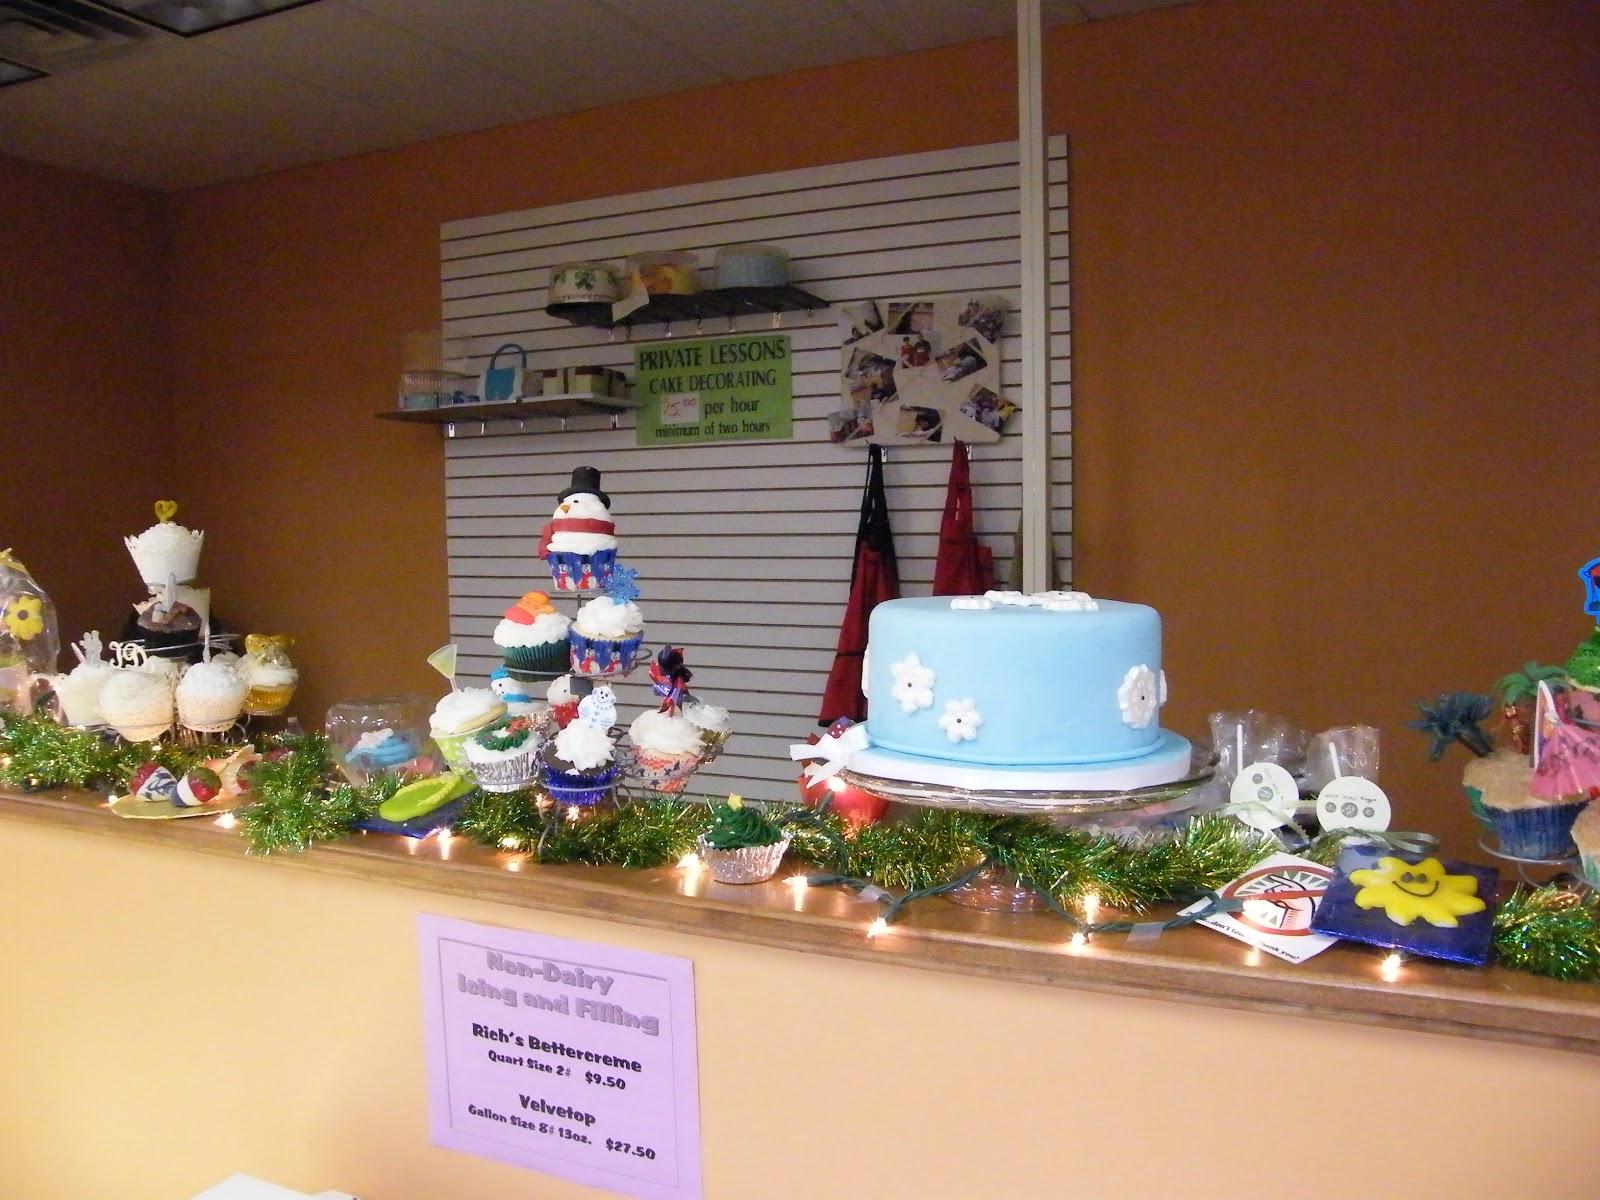 Lynn s Cake and Candy Supply, Monster Bash Sponsor ...